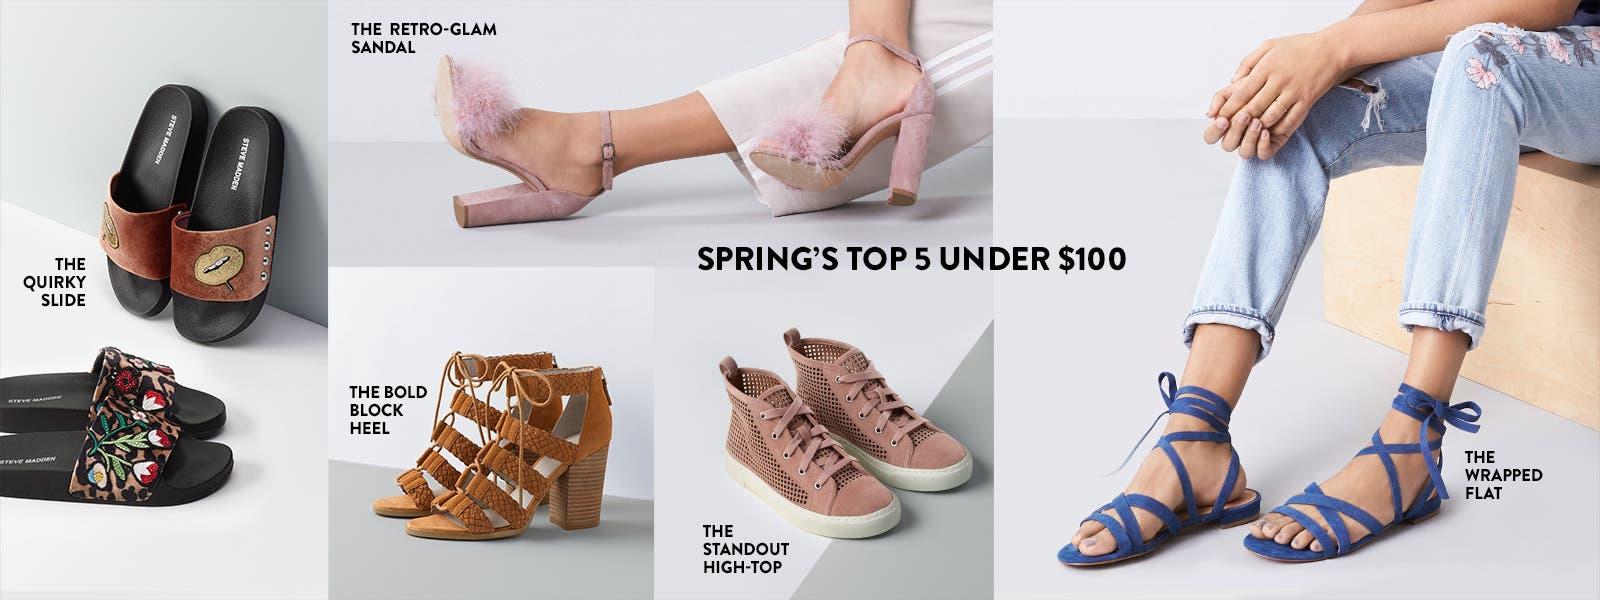 Spring's top 5 under $100.